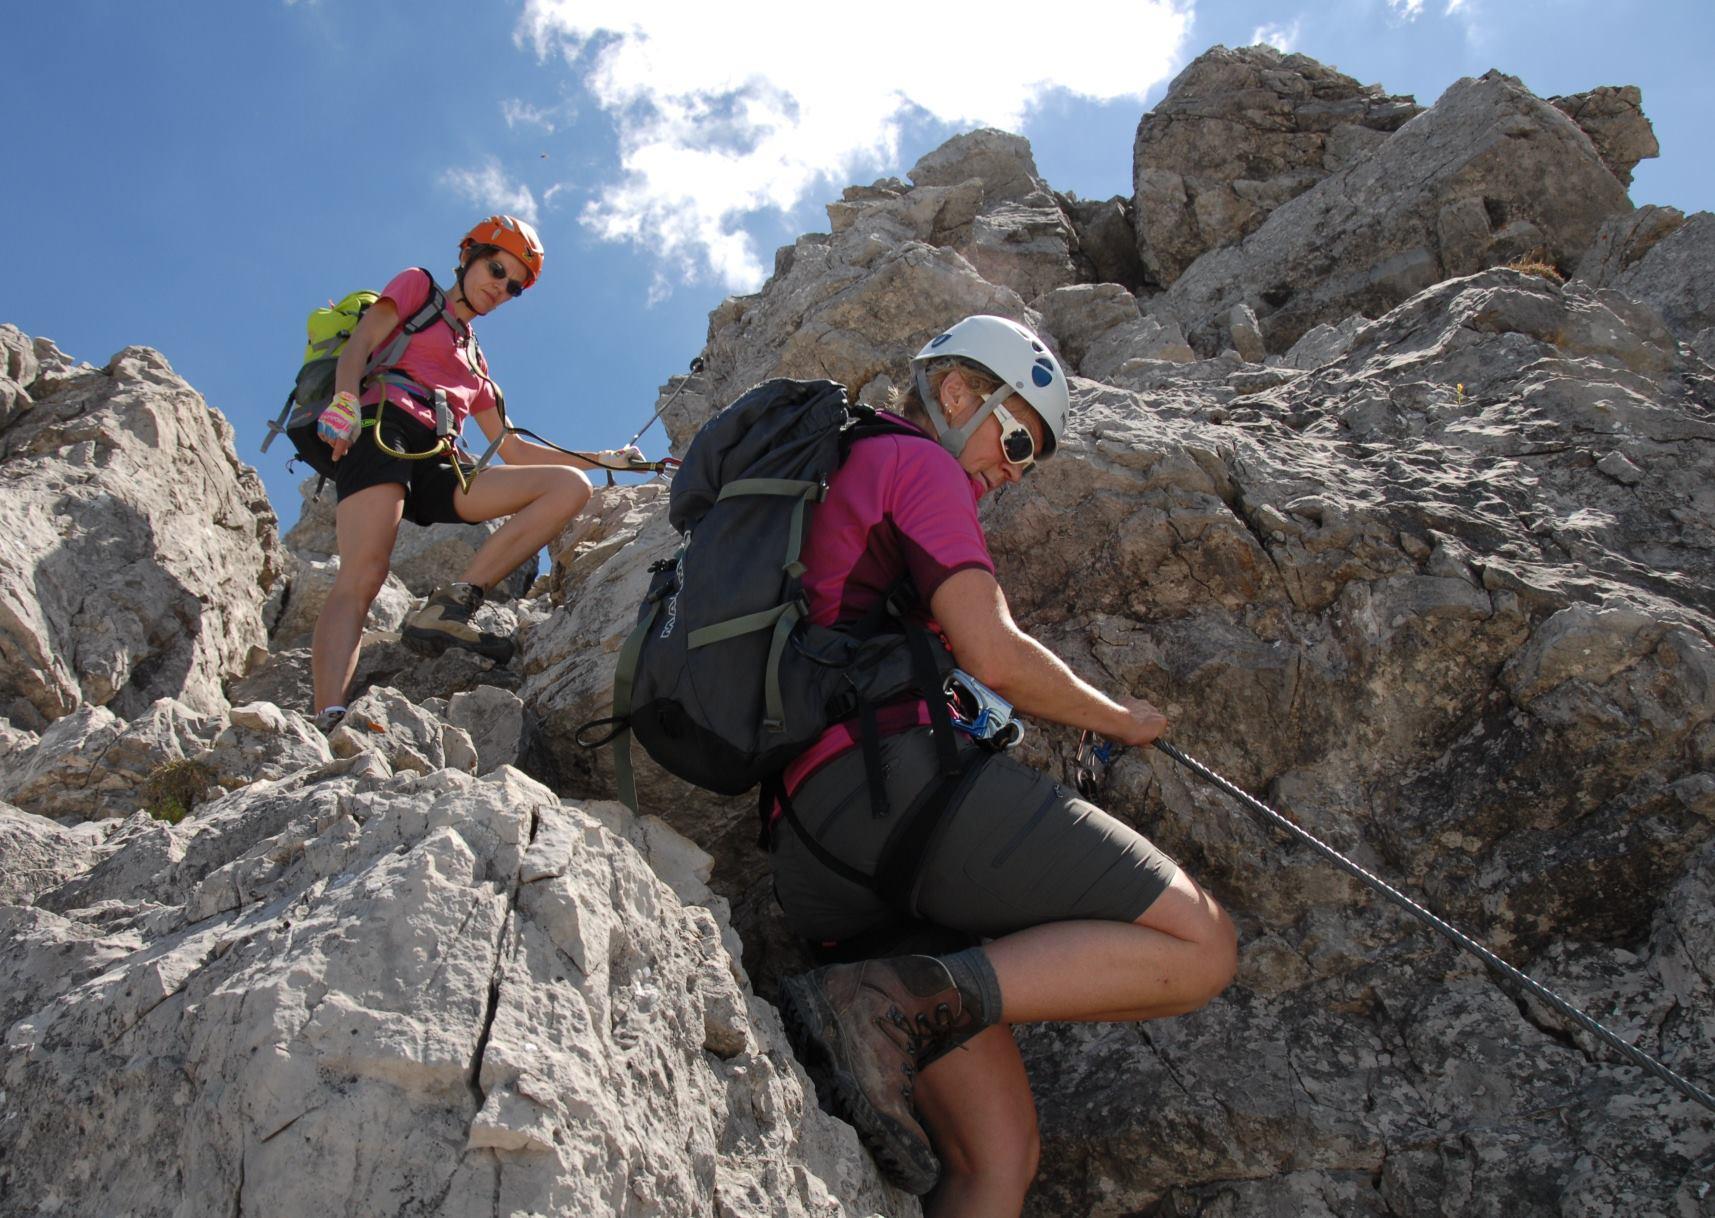 Mindelheimer Klettersteig Unfall : Klettersteig mindelheimer hÜtte